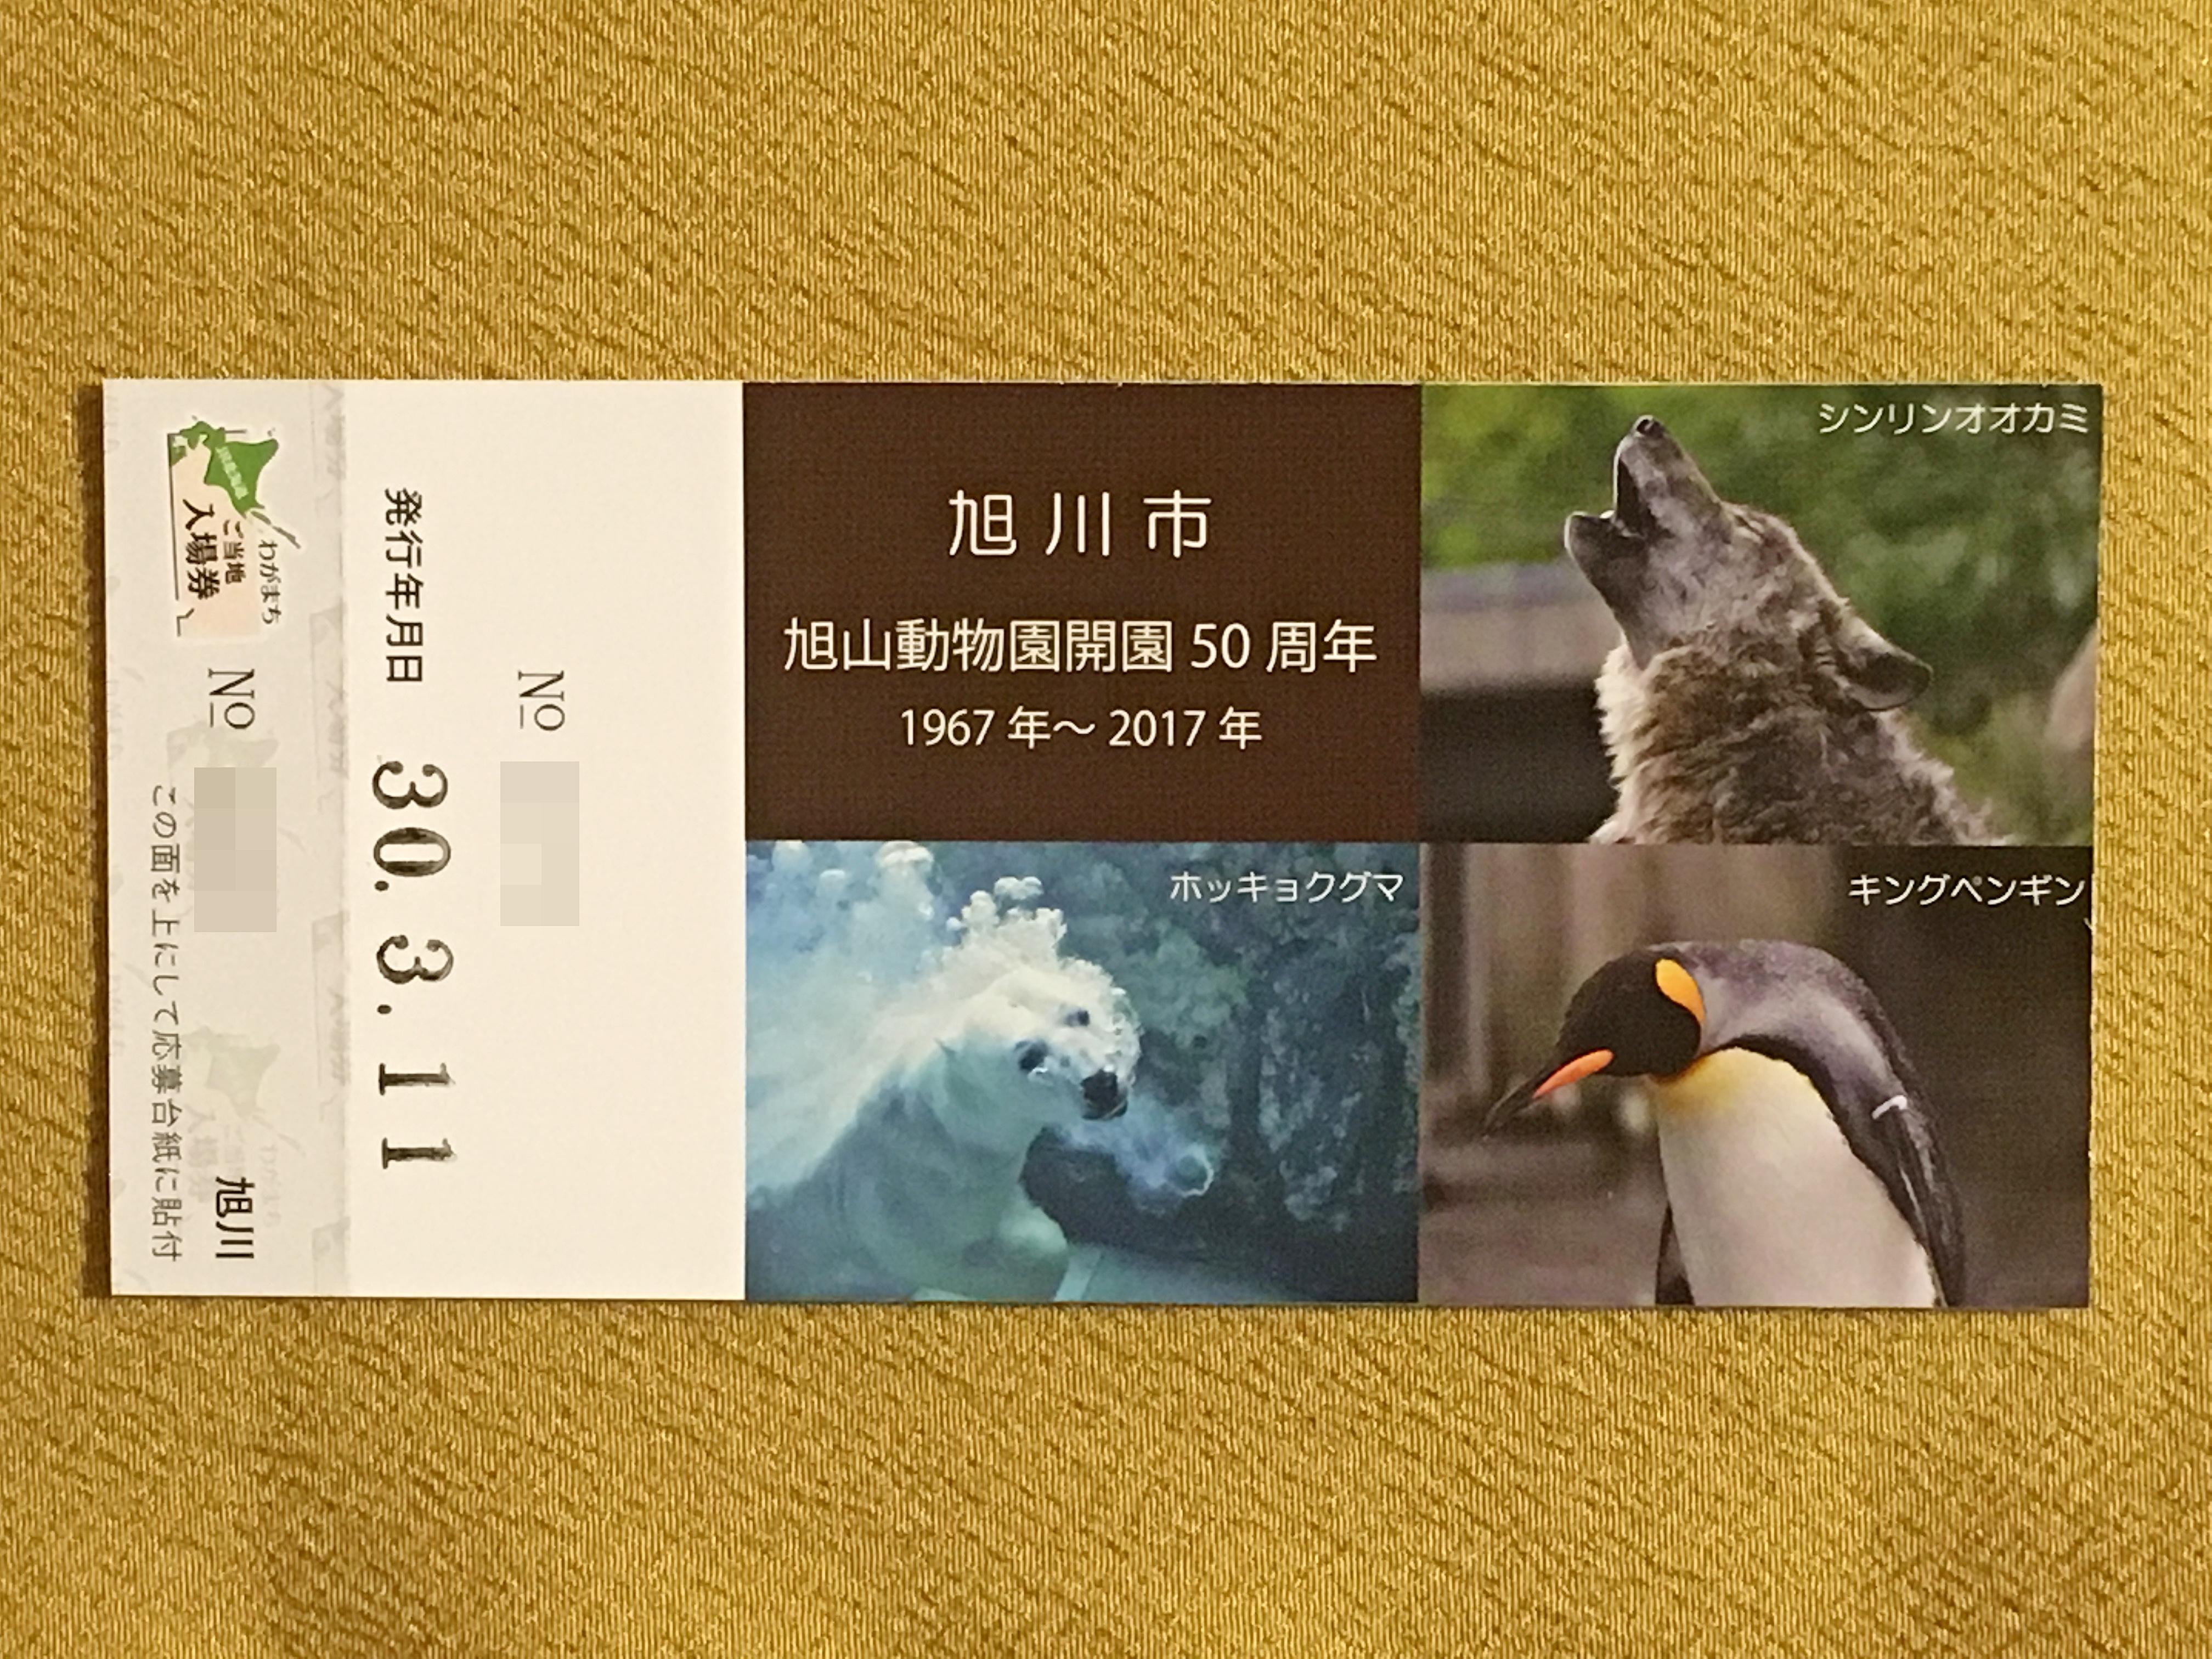 JR北海道ご当地入場券 旭川駅裏.JPG